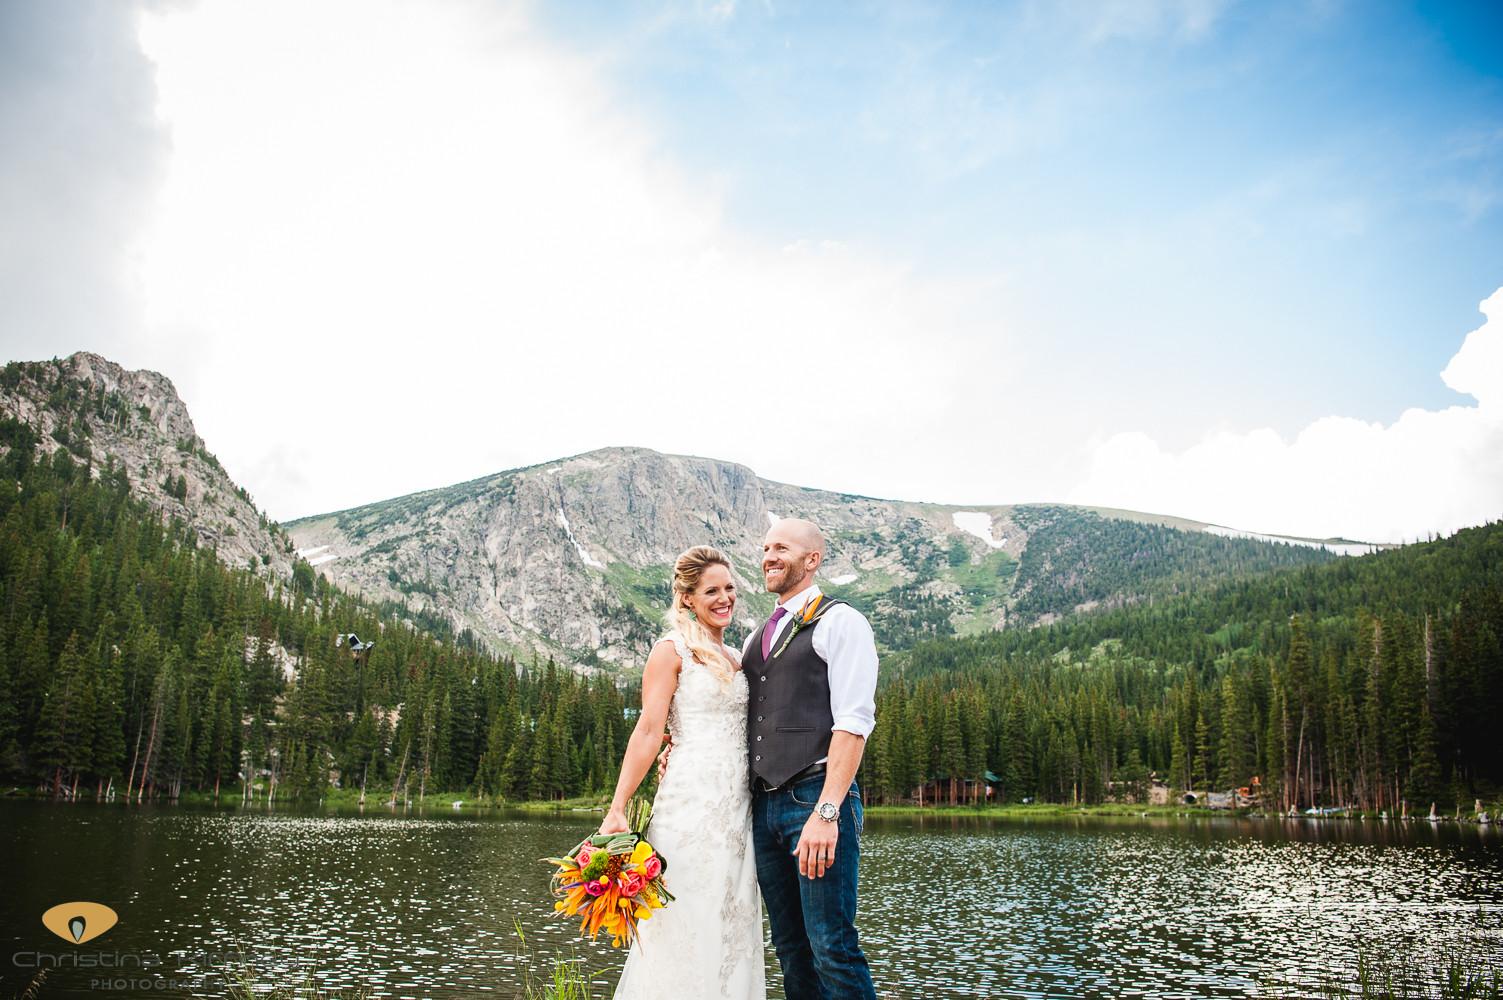 ckp-Colorado-Family-Elopement-0084.jpg